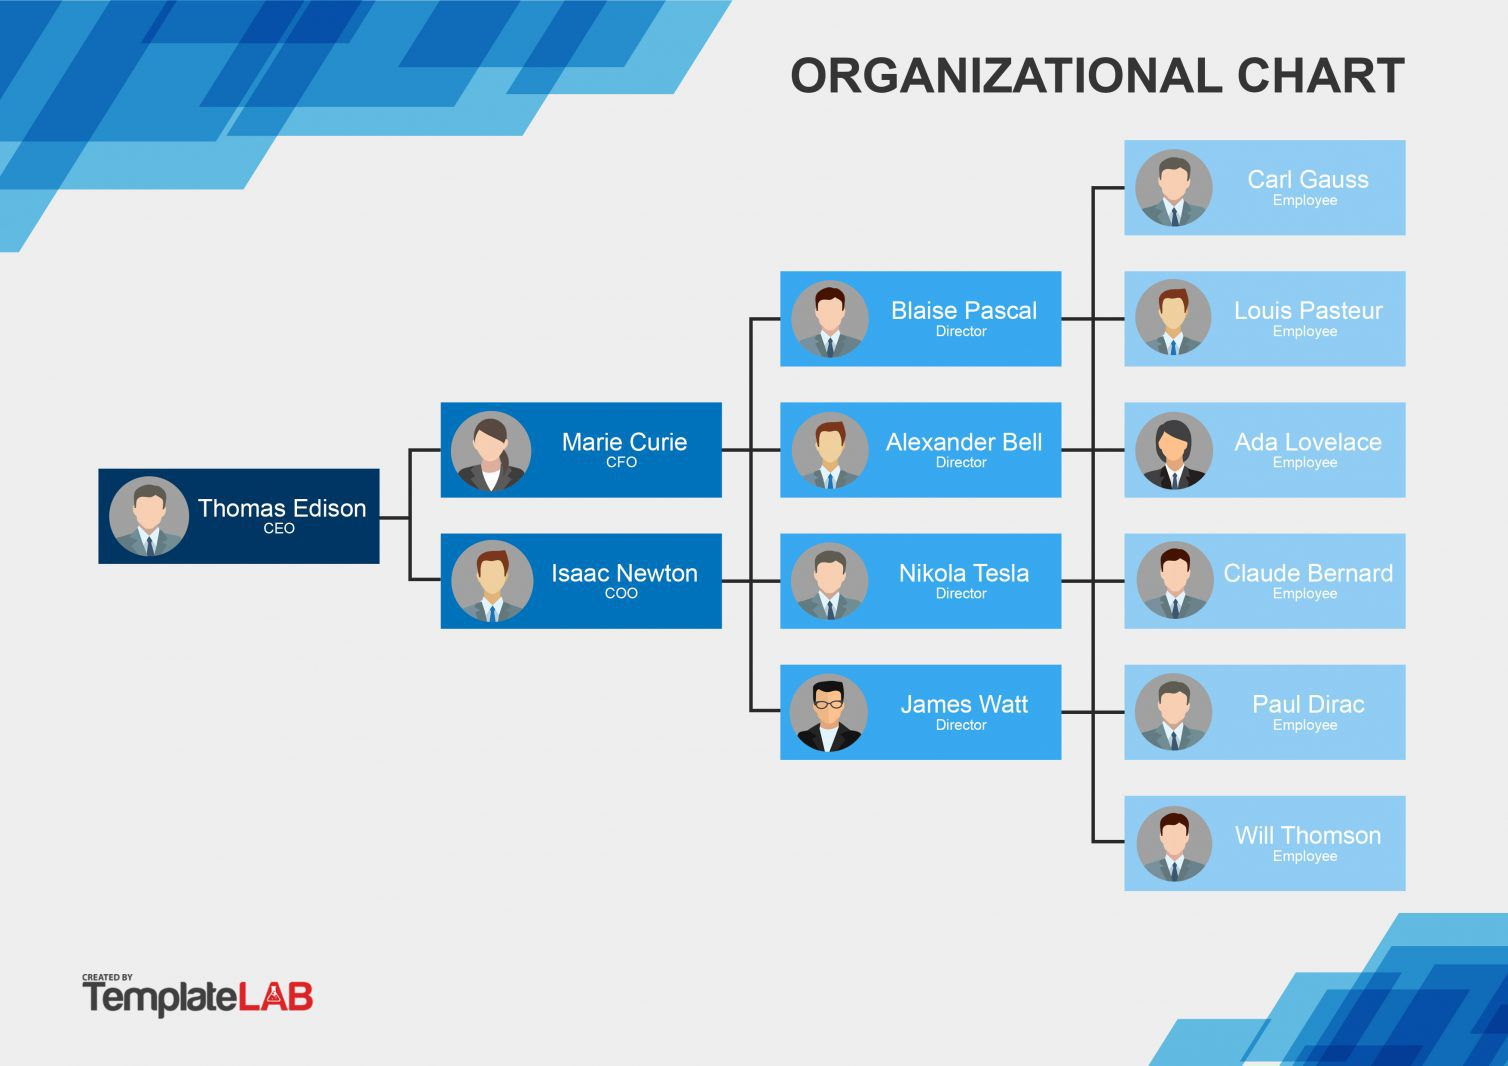 008 Wondrou Org Chart Template Powerpoint Example  Organization Free Download Organizational 2010 2013Full